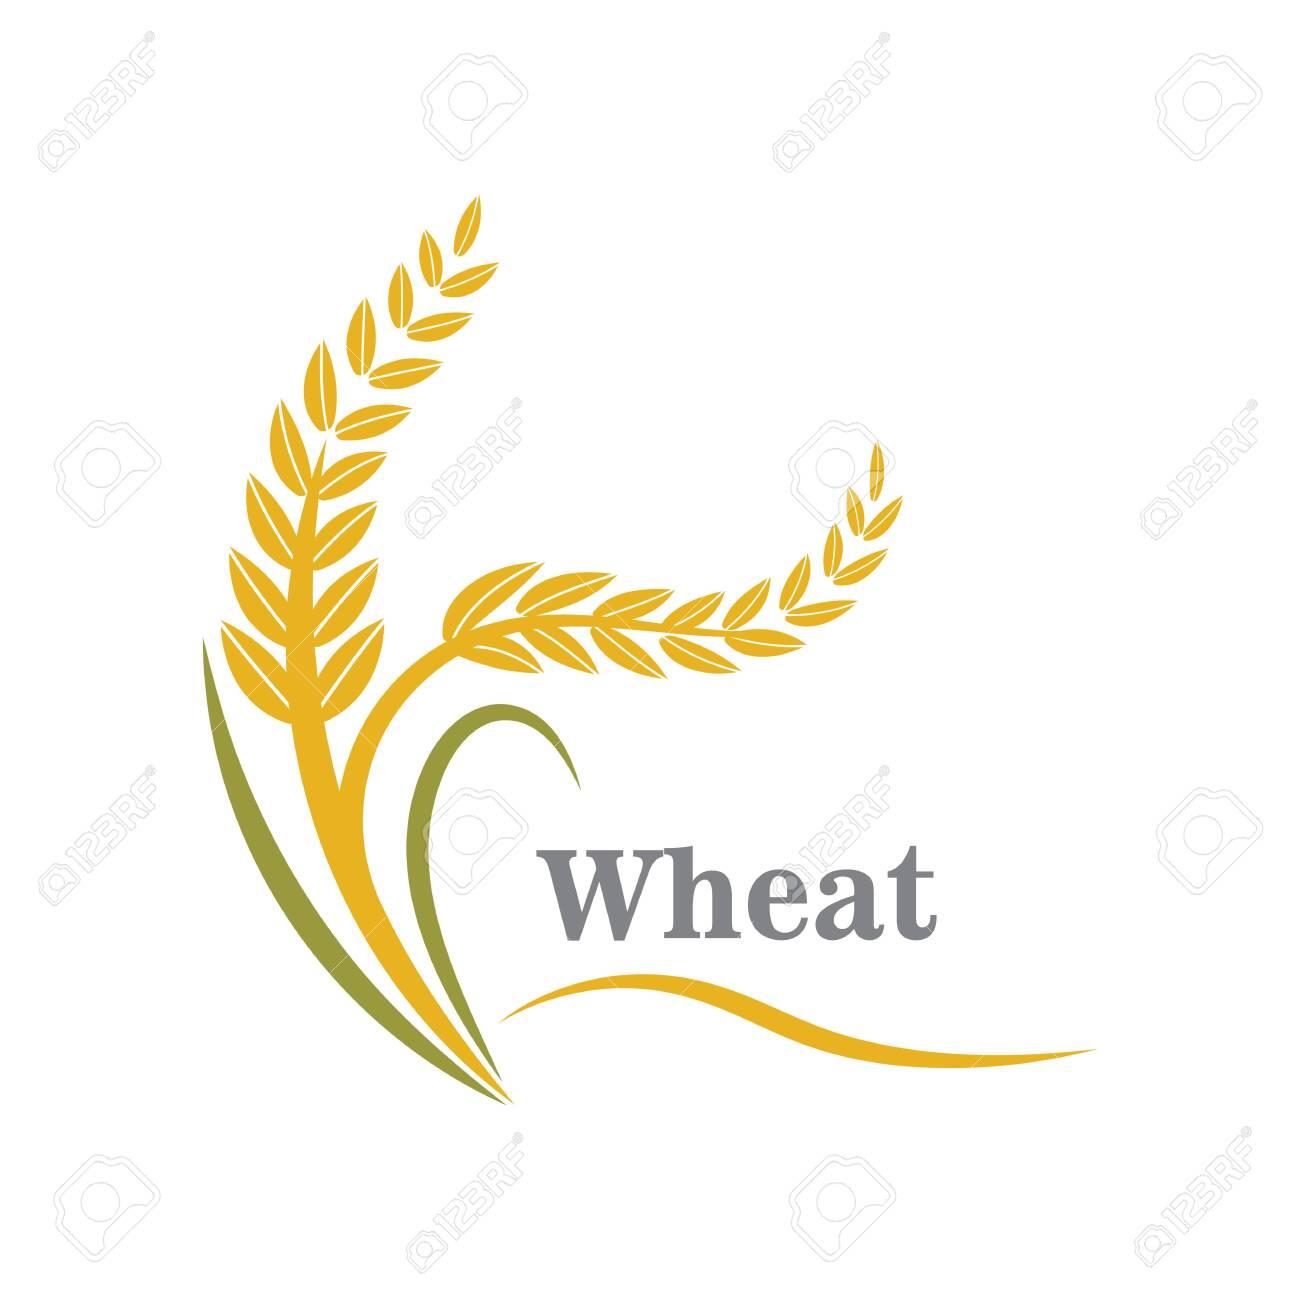 Agriculture wheat logo or symbol icon design illustration - 146115827